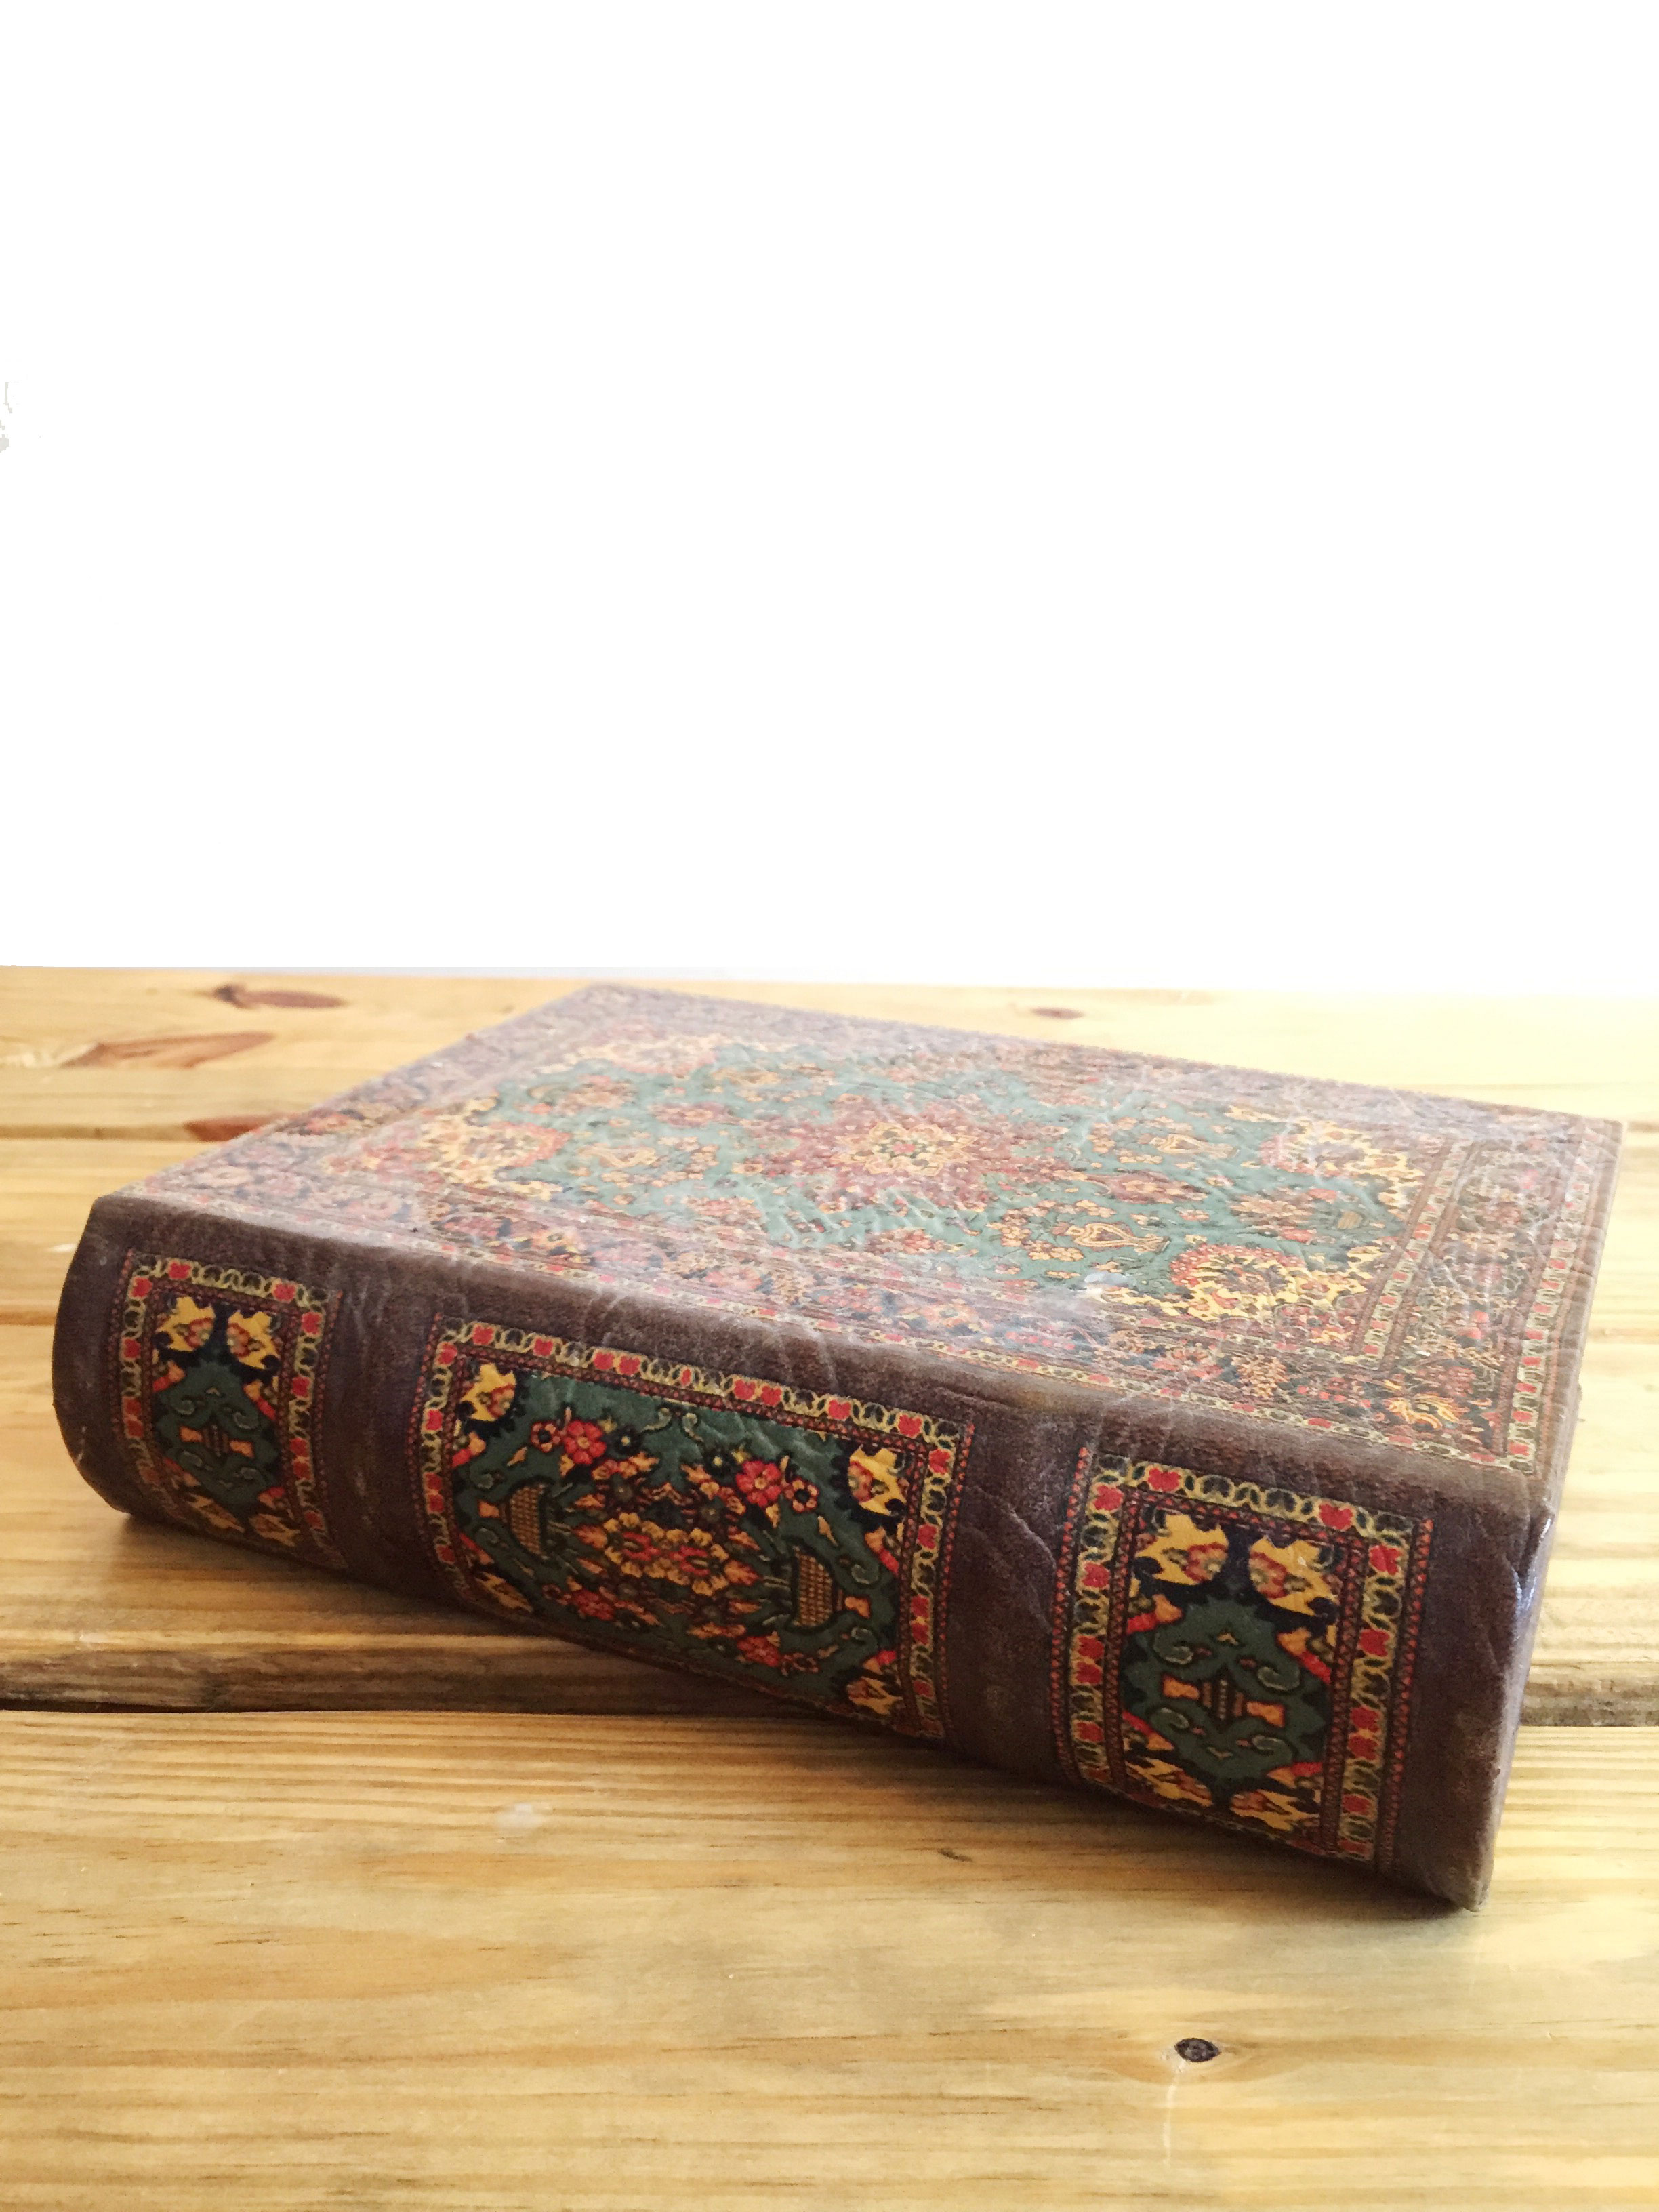 Vintage Centerpiece Book